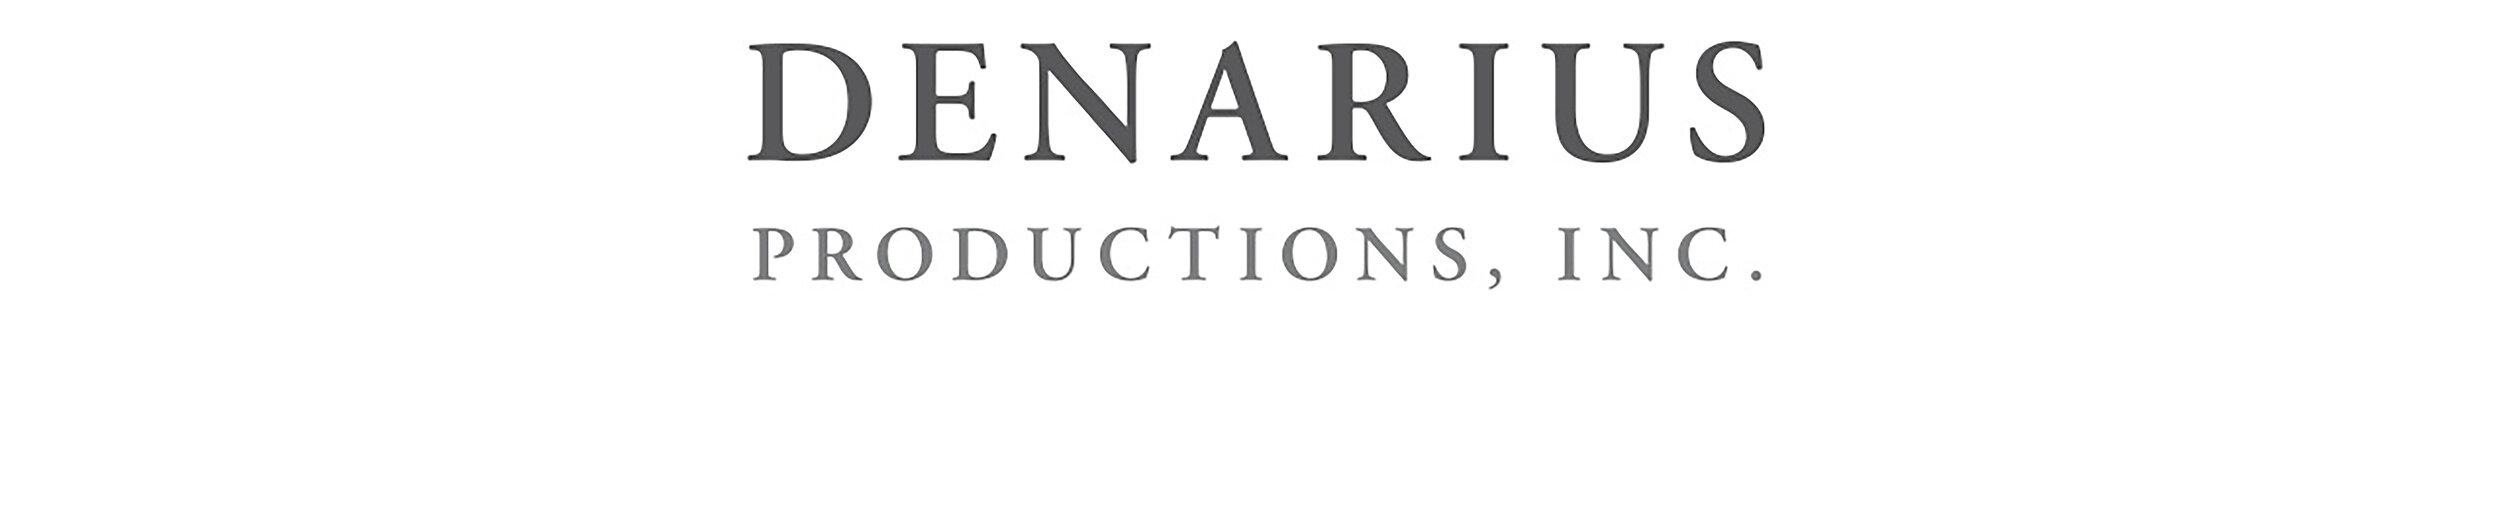 Denarius_Logo_Round1500.jpg